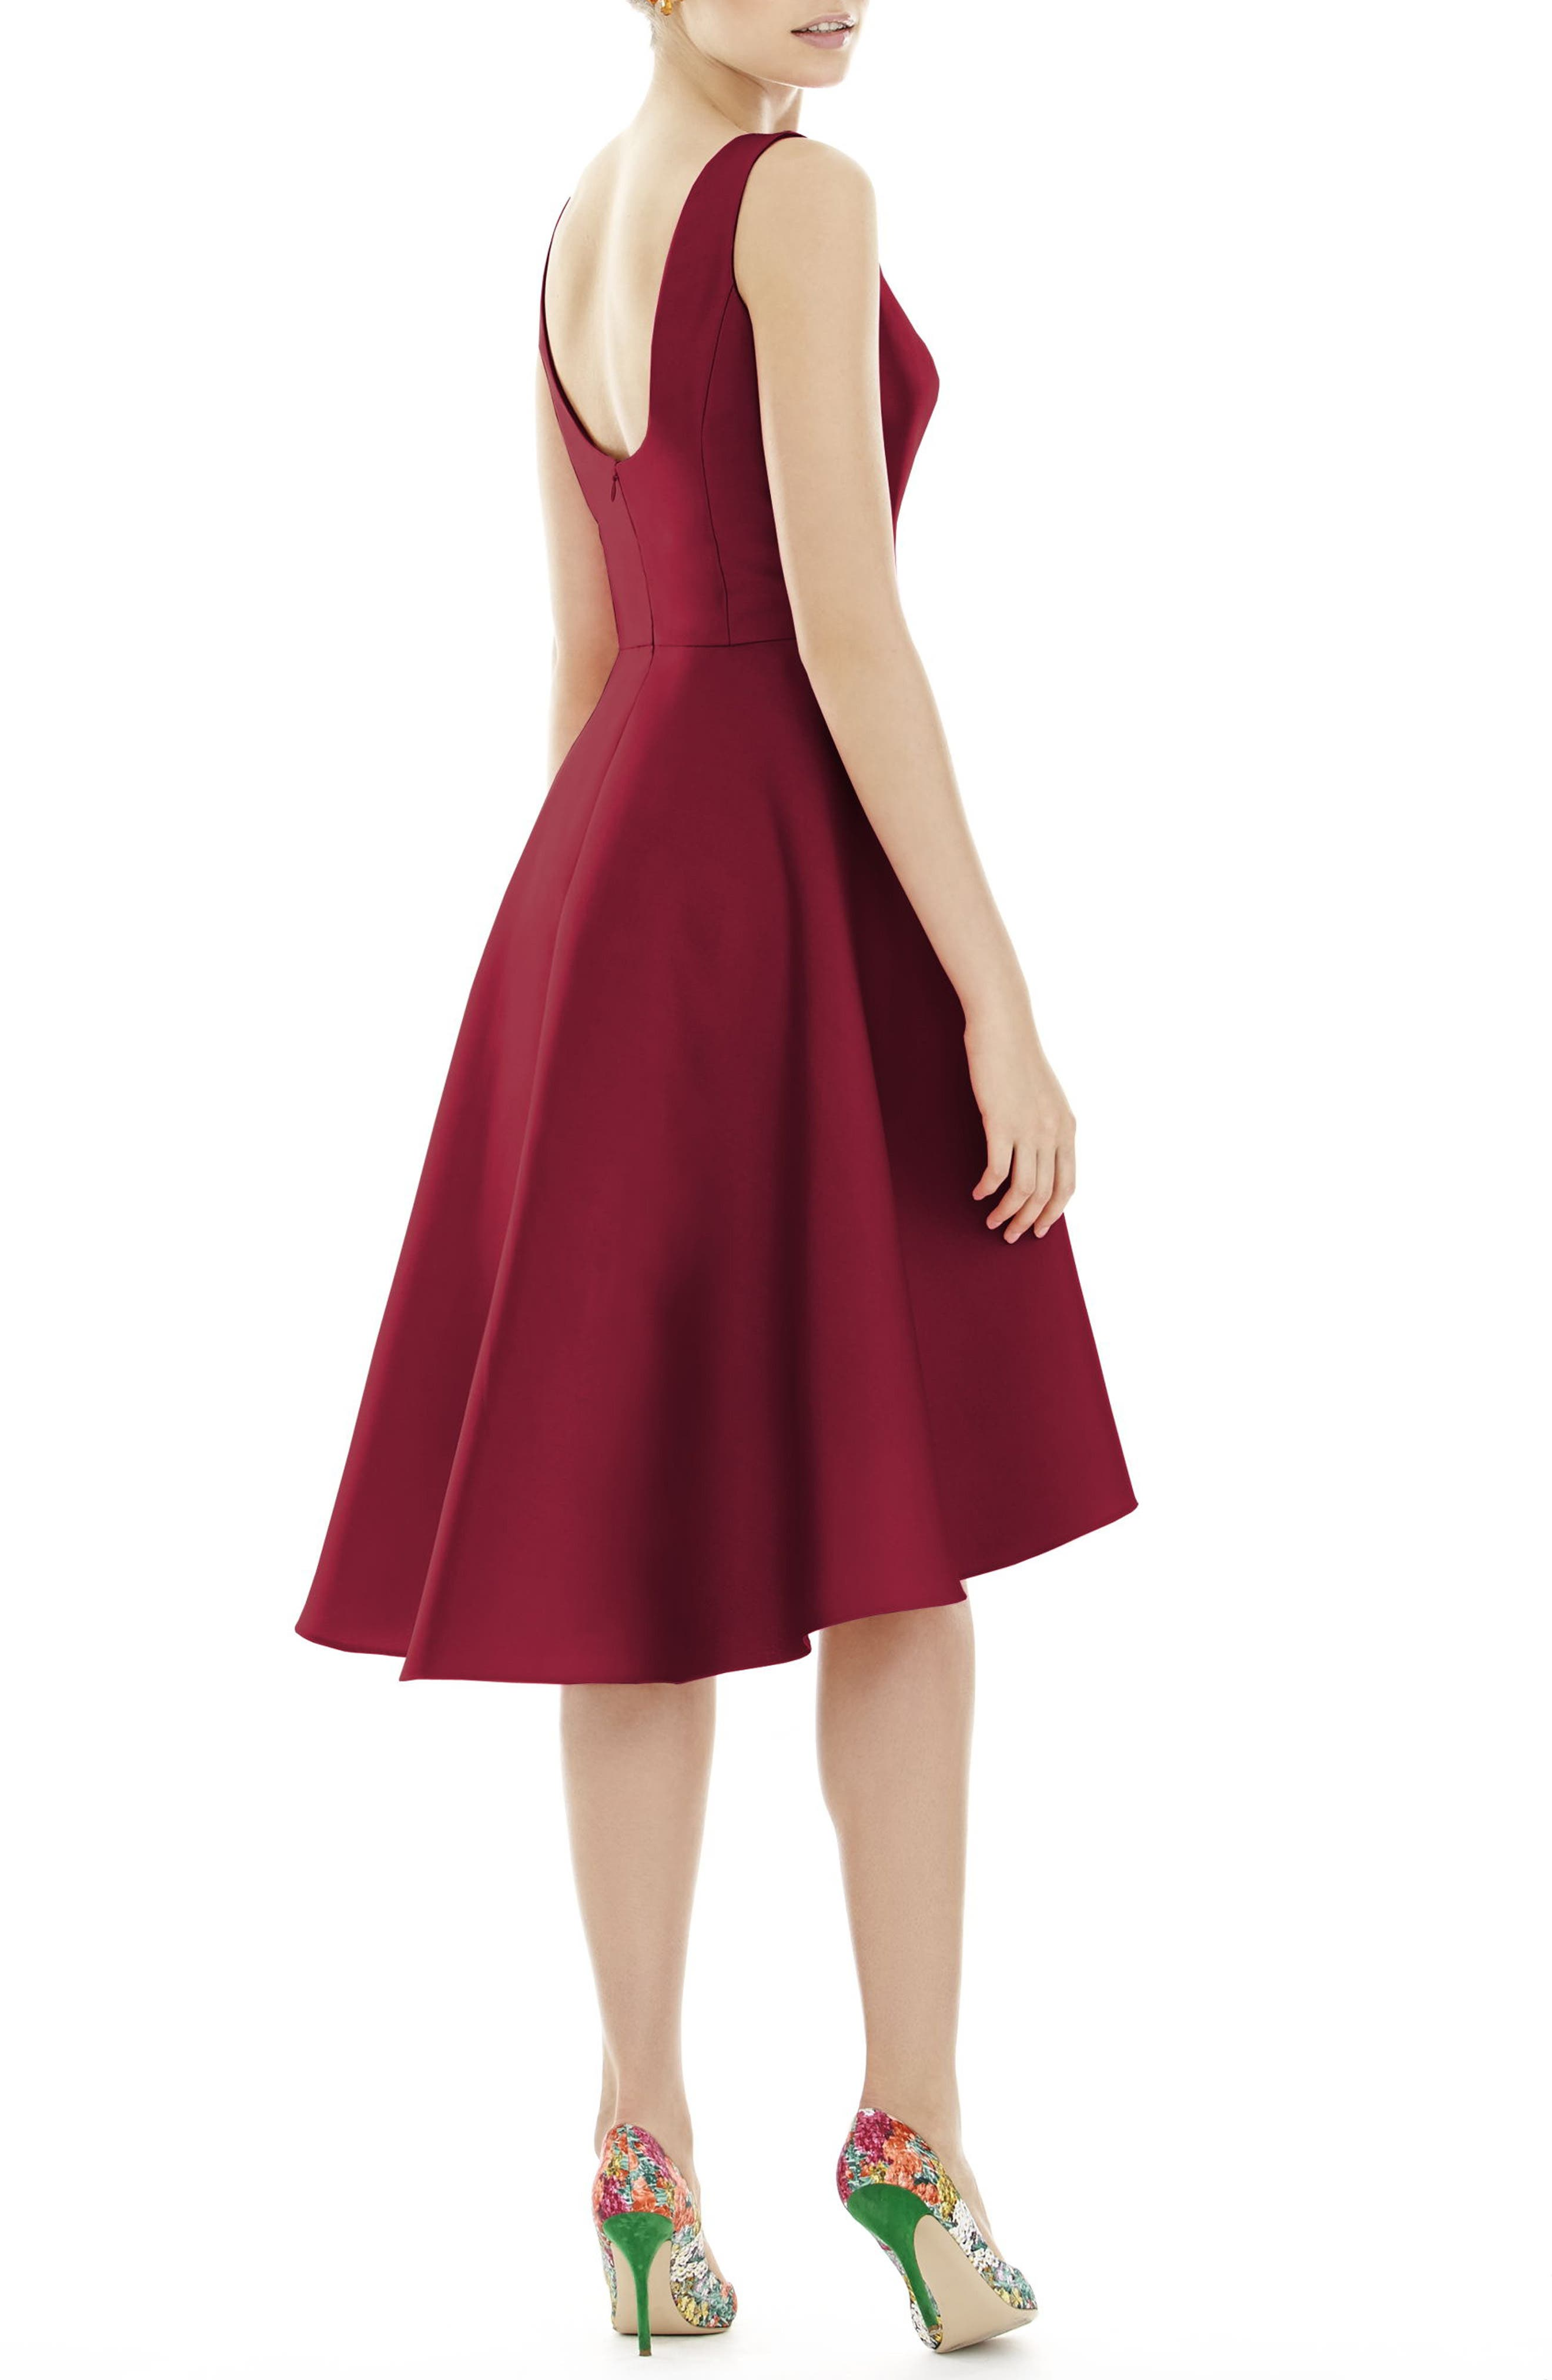 98ef118d57 Women's Satin Dresses | Nordstrom